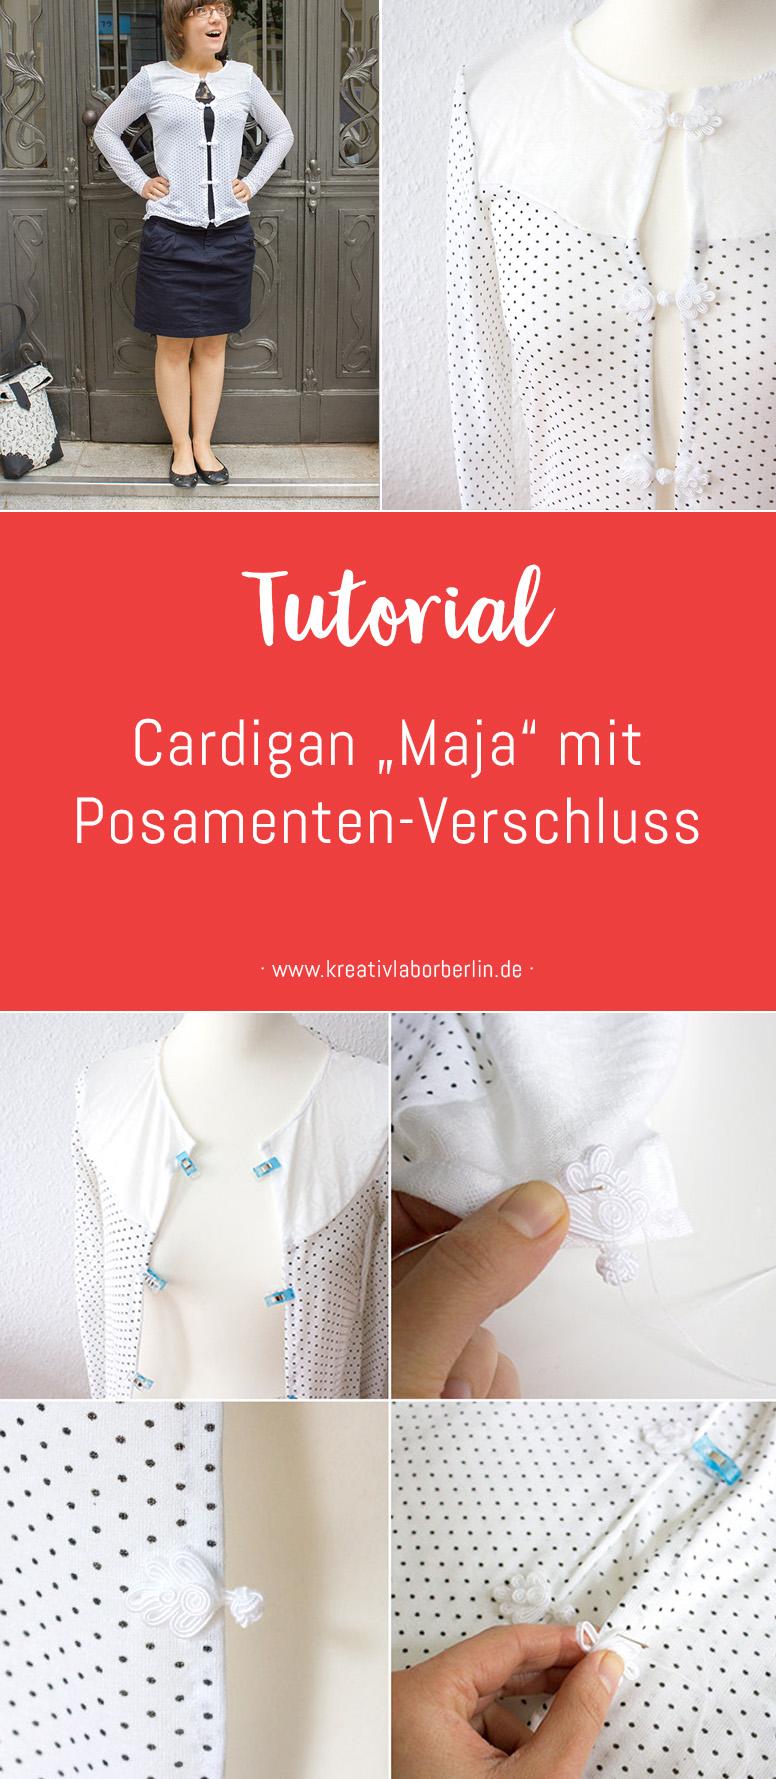 "DIY-Anleitung: Cardigan ""Maja"" mit Posamenten-Verschluss"